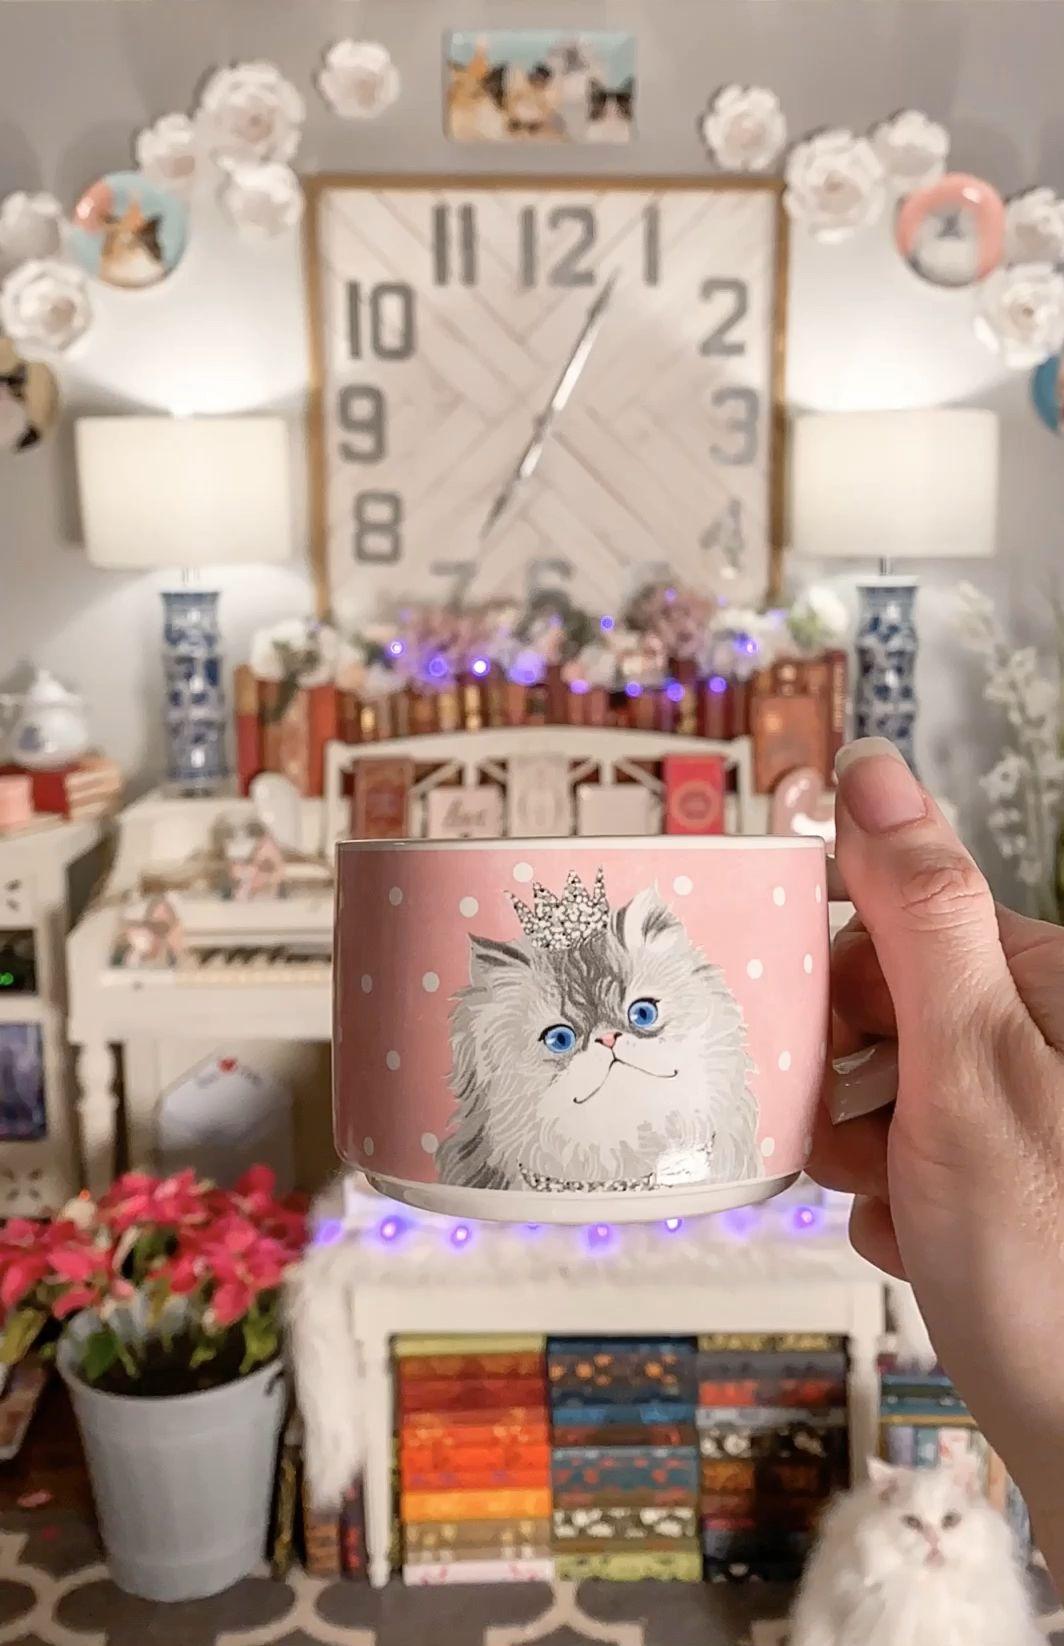 Cat coffee mugs in pink blue and yellow in front of piano living room scene | #coffee #coffeetime #coffeelover #coffeeshop #coffeestation #caffeine #caffeineaddict #cats #catsofinstagram #catsagram #catlovers #catholic #catsandkittens #mug #muglife #pier1love #pier1 #shabbychic #shabbychicdecor #shabbychicfurniture #shabbychicstyledecor